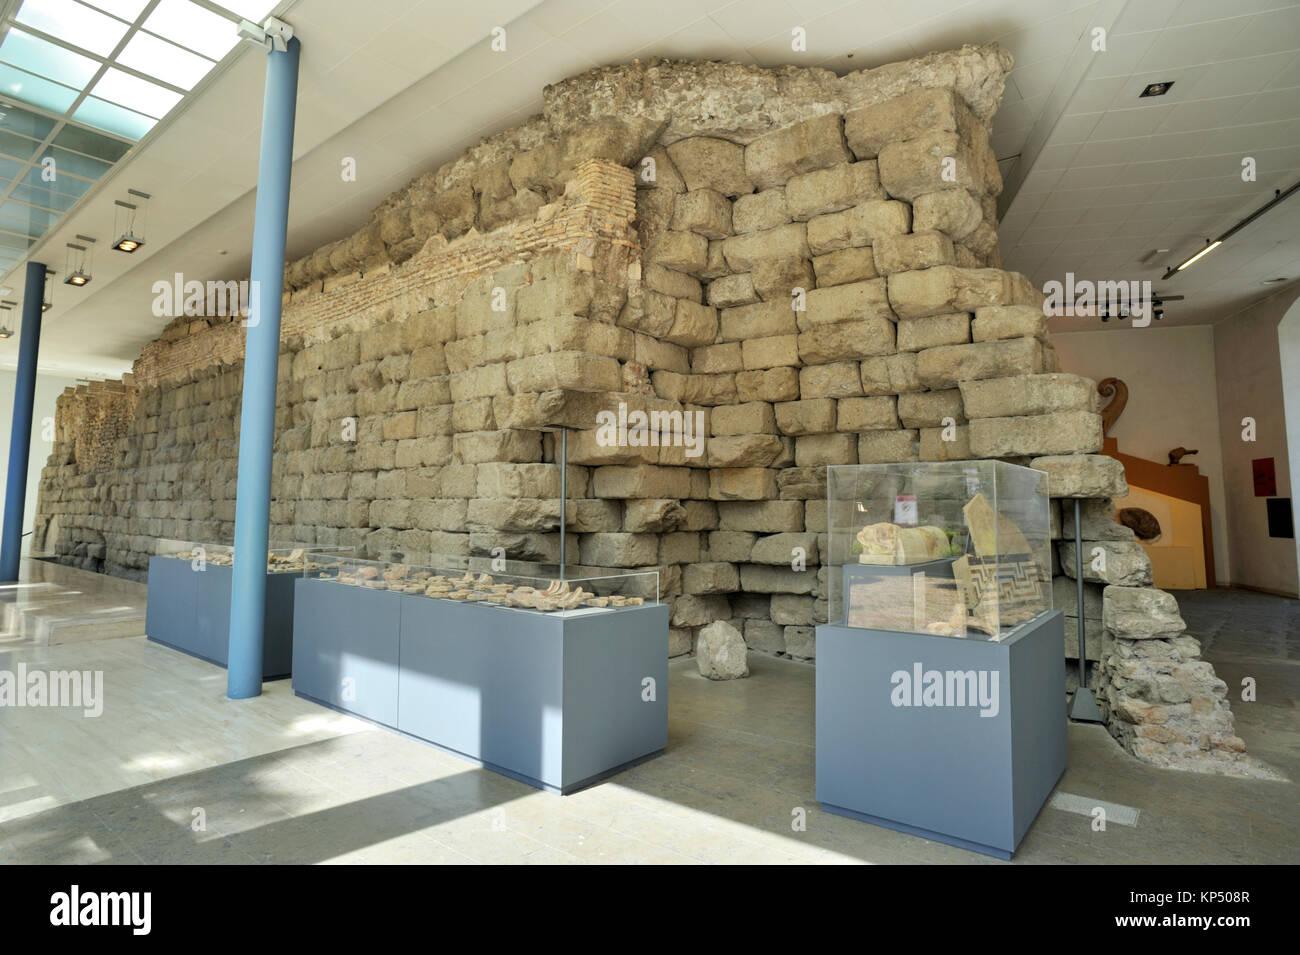 L'Italie, Rome, Musées du Capitole, Musei Capitolini, Palazzo dei Conservatori, temple de Jupiter Capitolin, Photo Stock